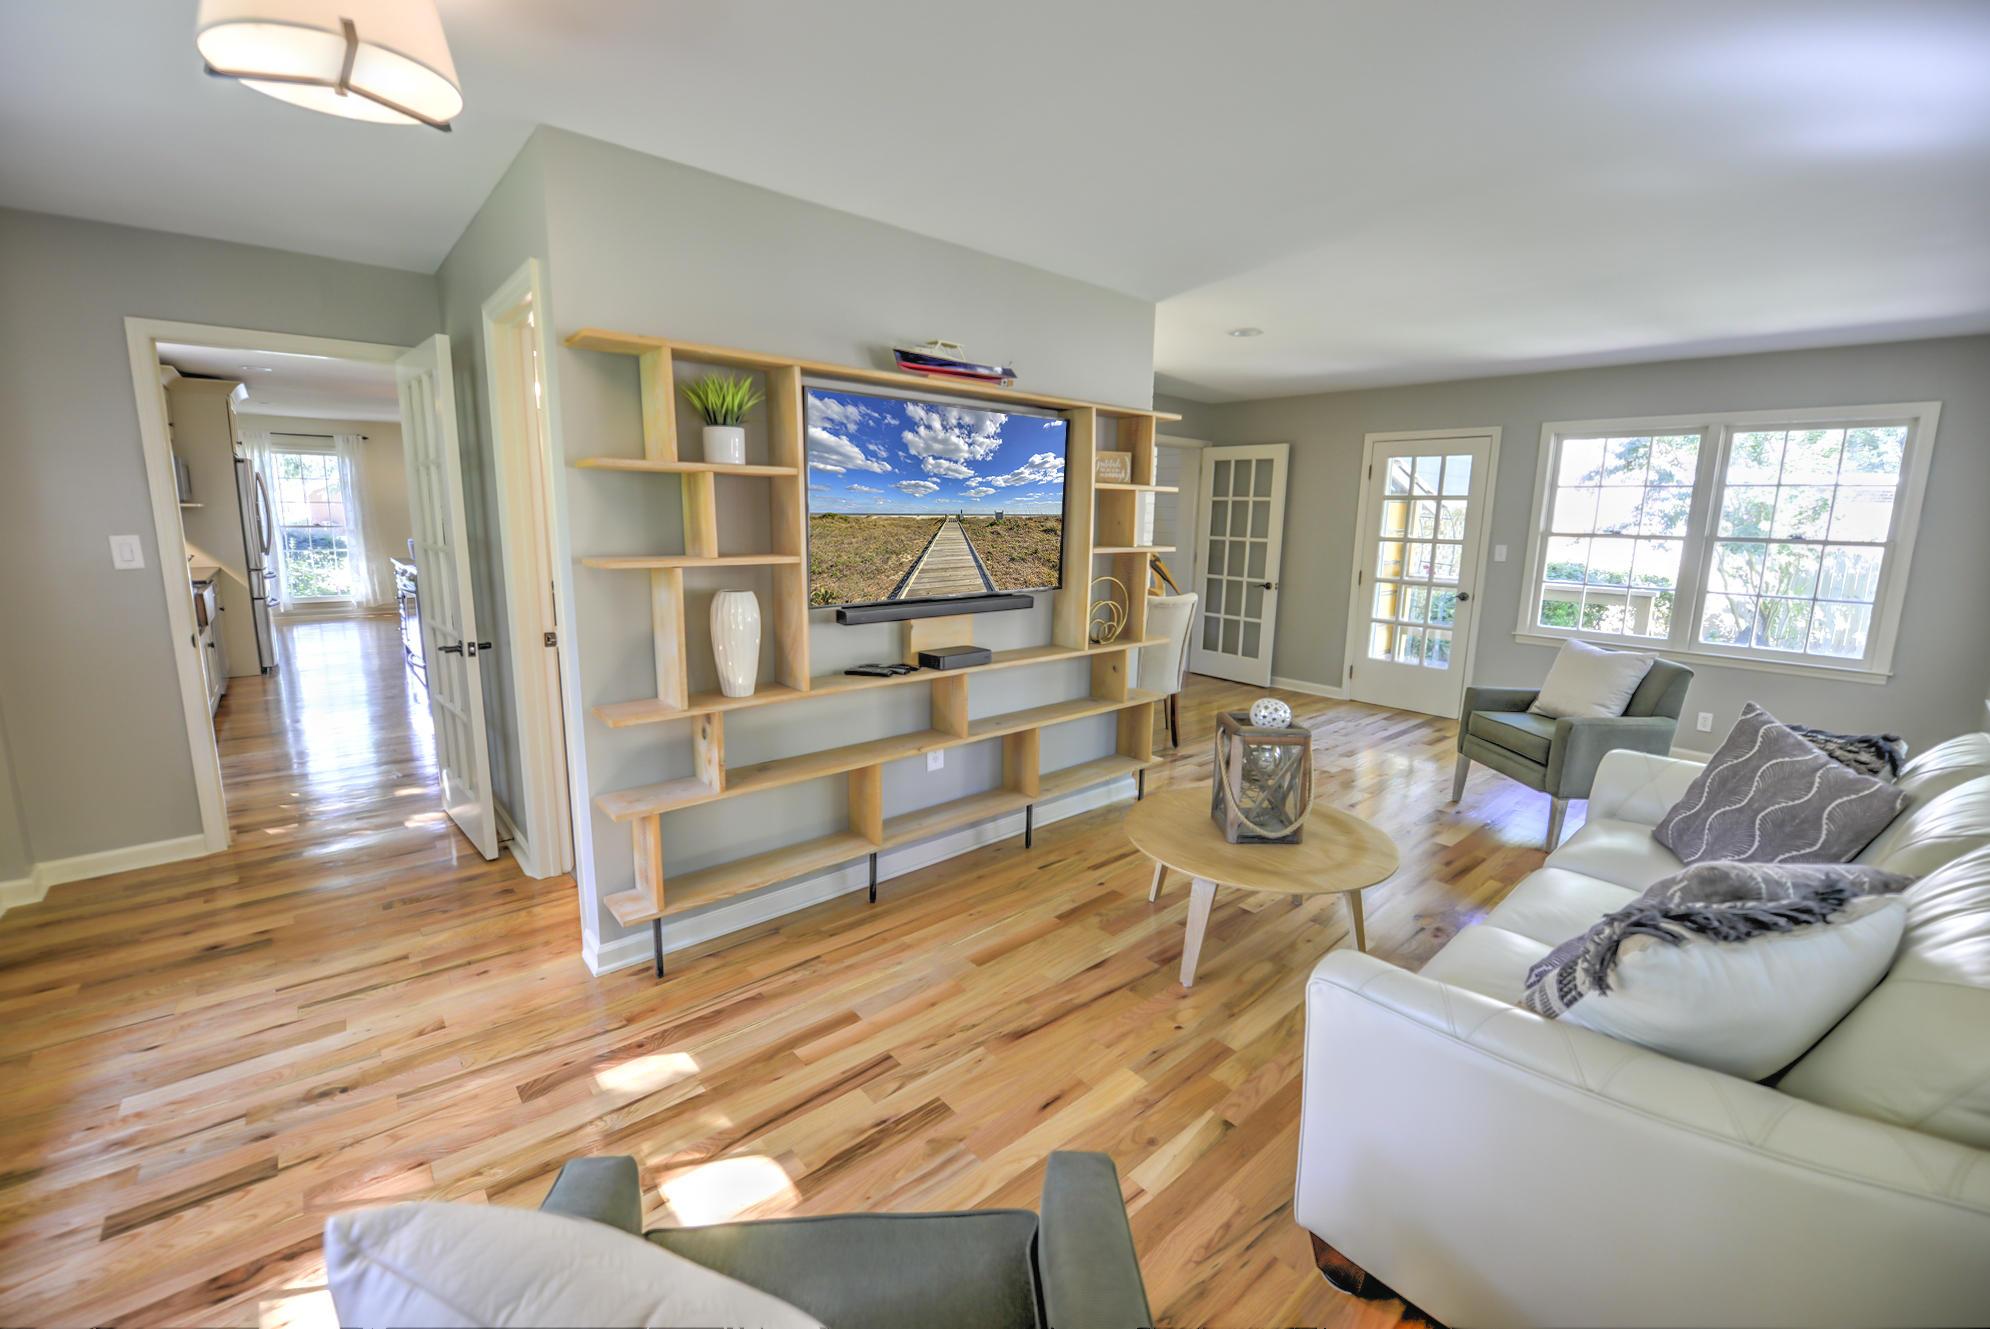 Shemwood II Homes For Sale - 1017 Jack Snipe, Mount Pleasant, SC - 7